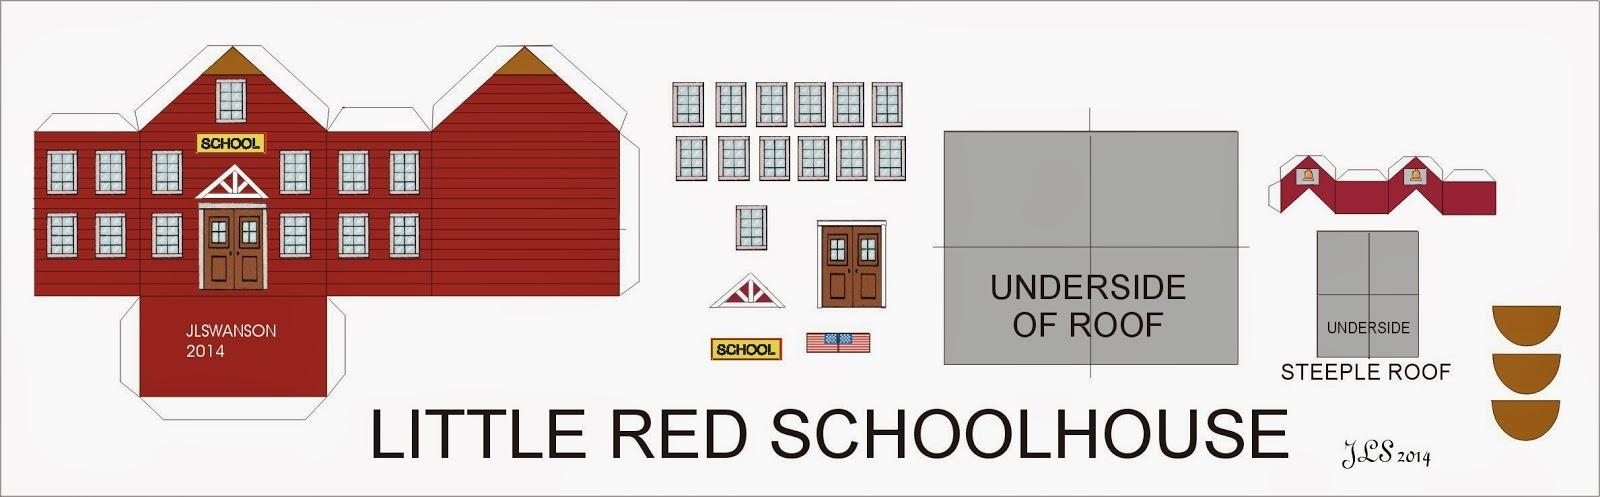 Dyi Dollhouse Miniatures The Little Red Schoolhouse